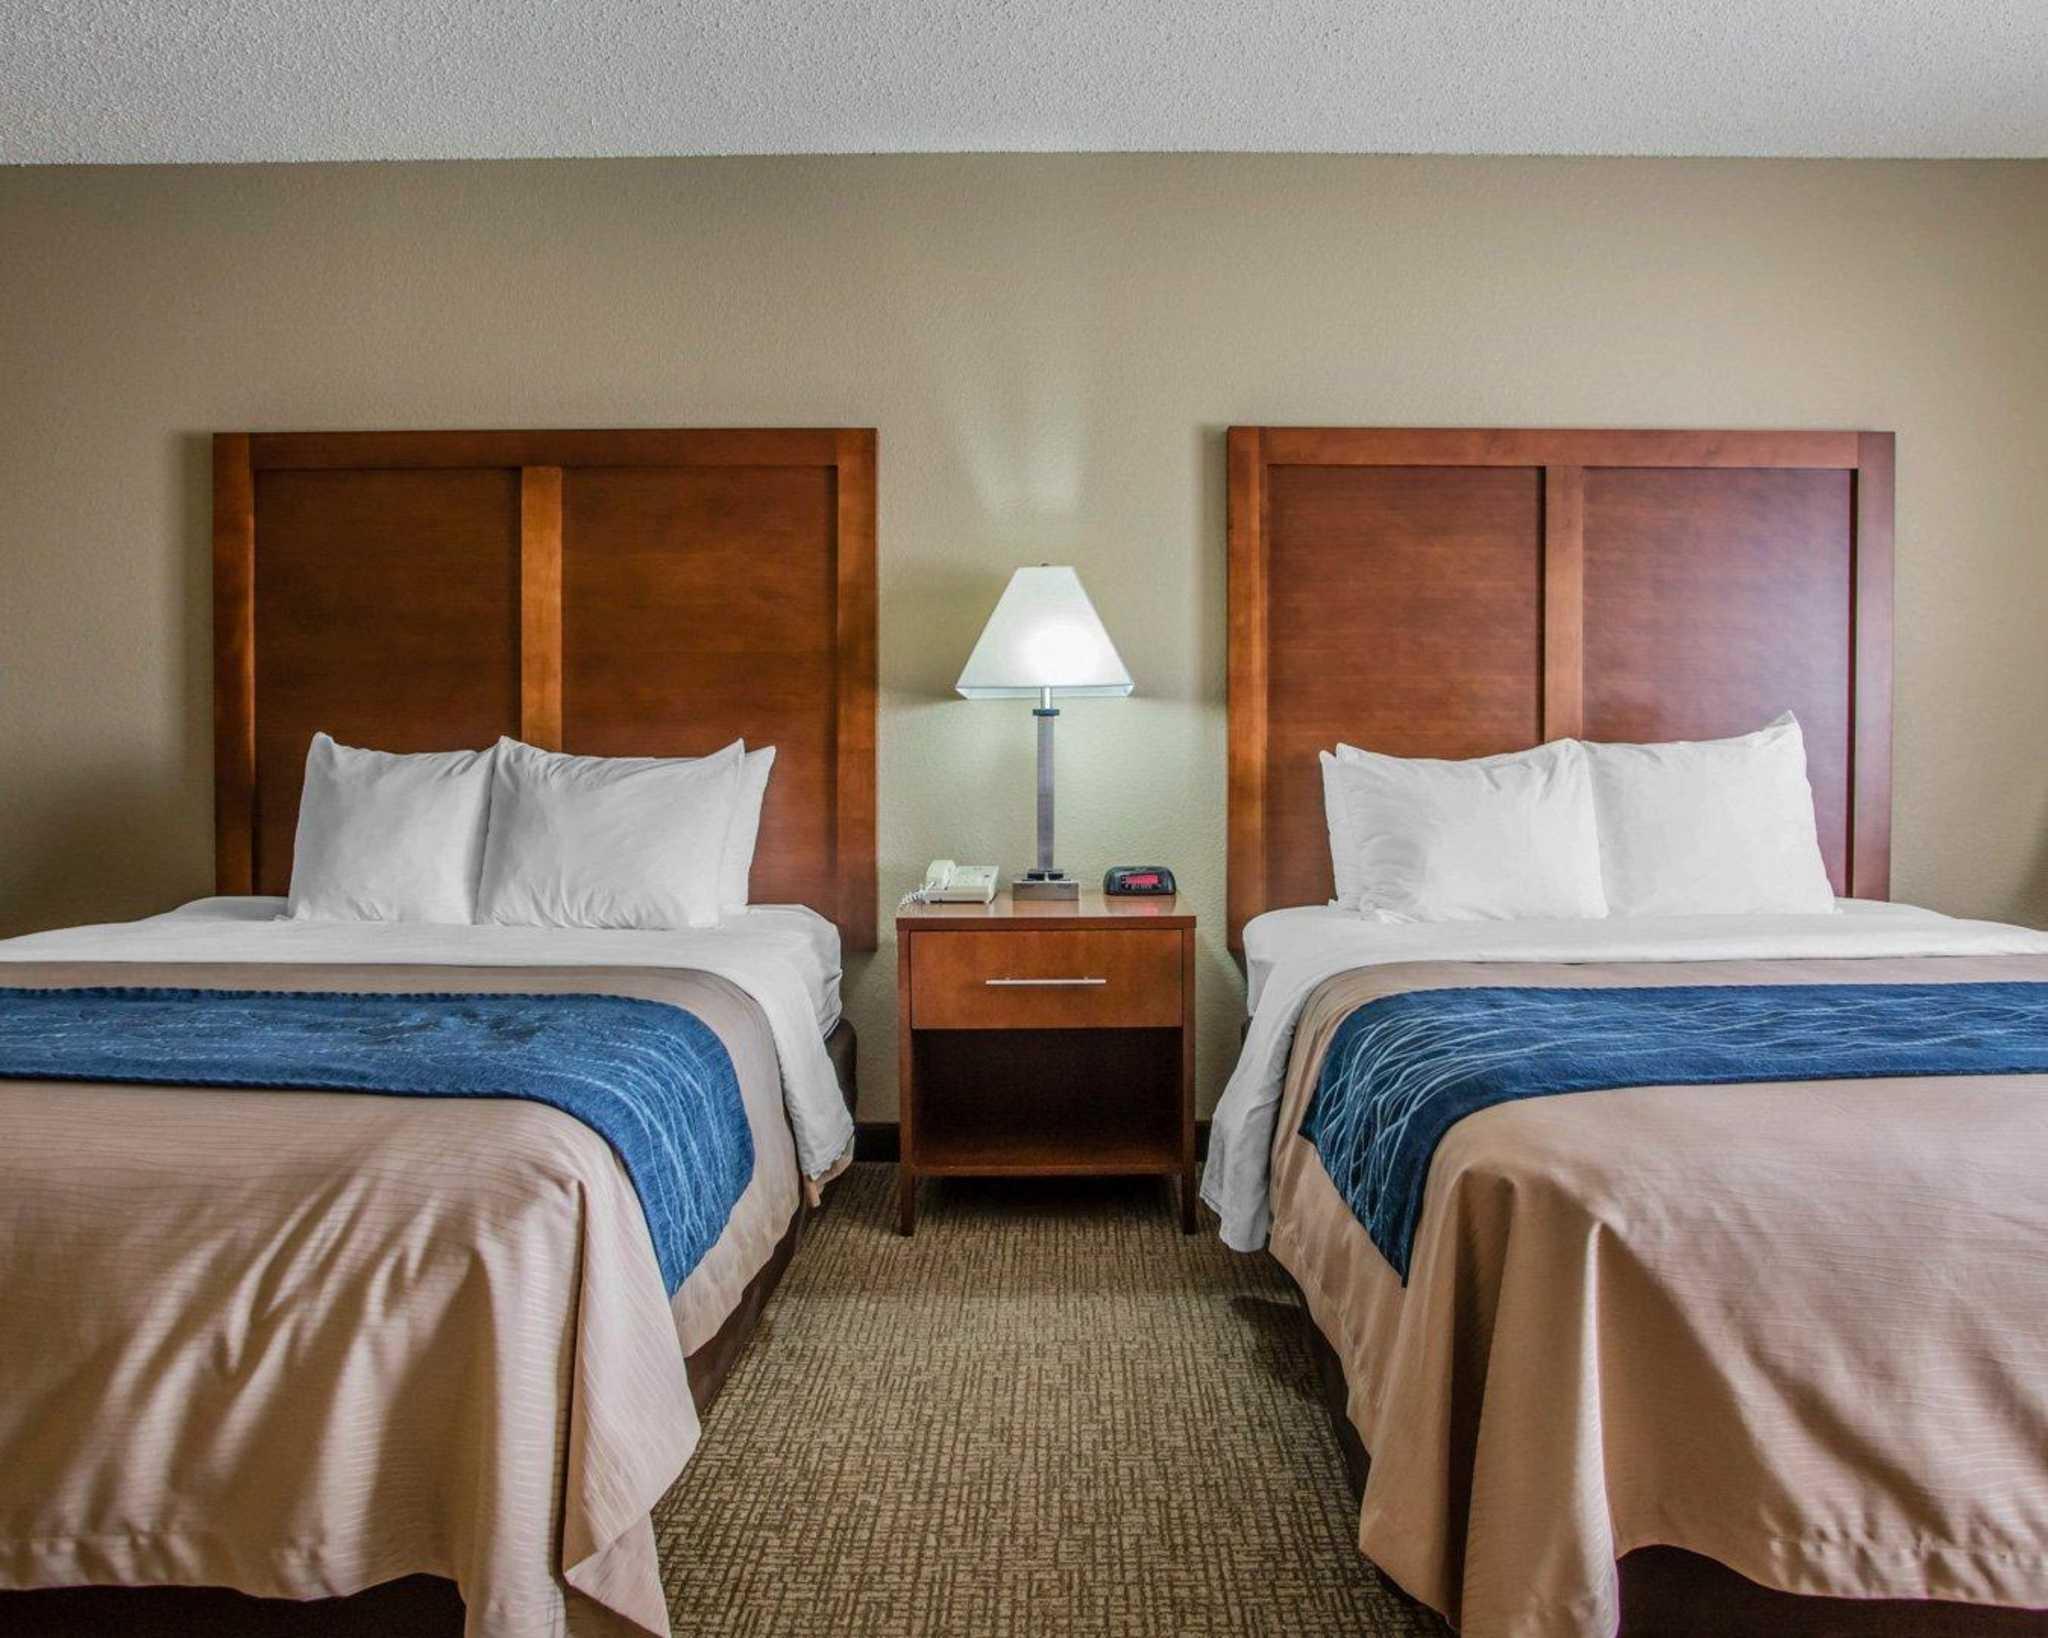 Comfort Inn & Suites Jackson - West Bend image 3